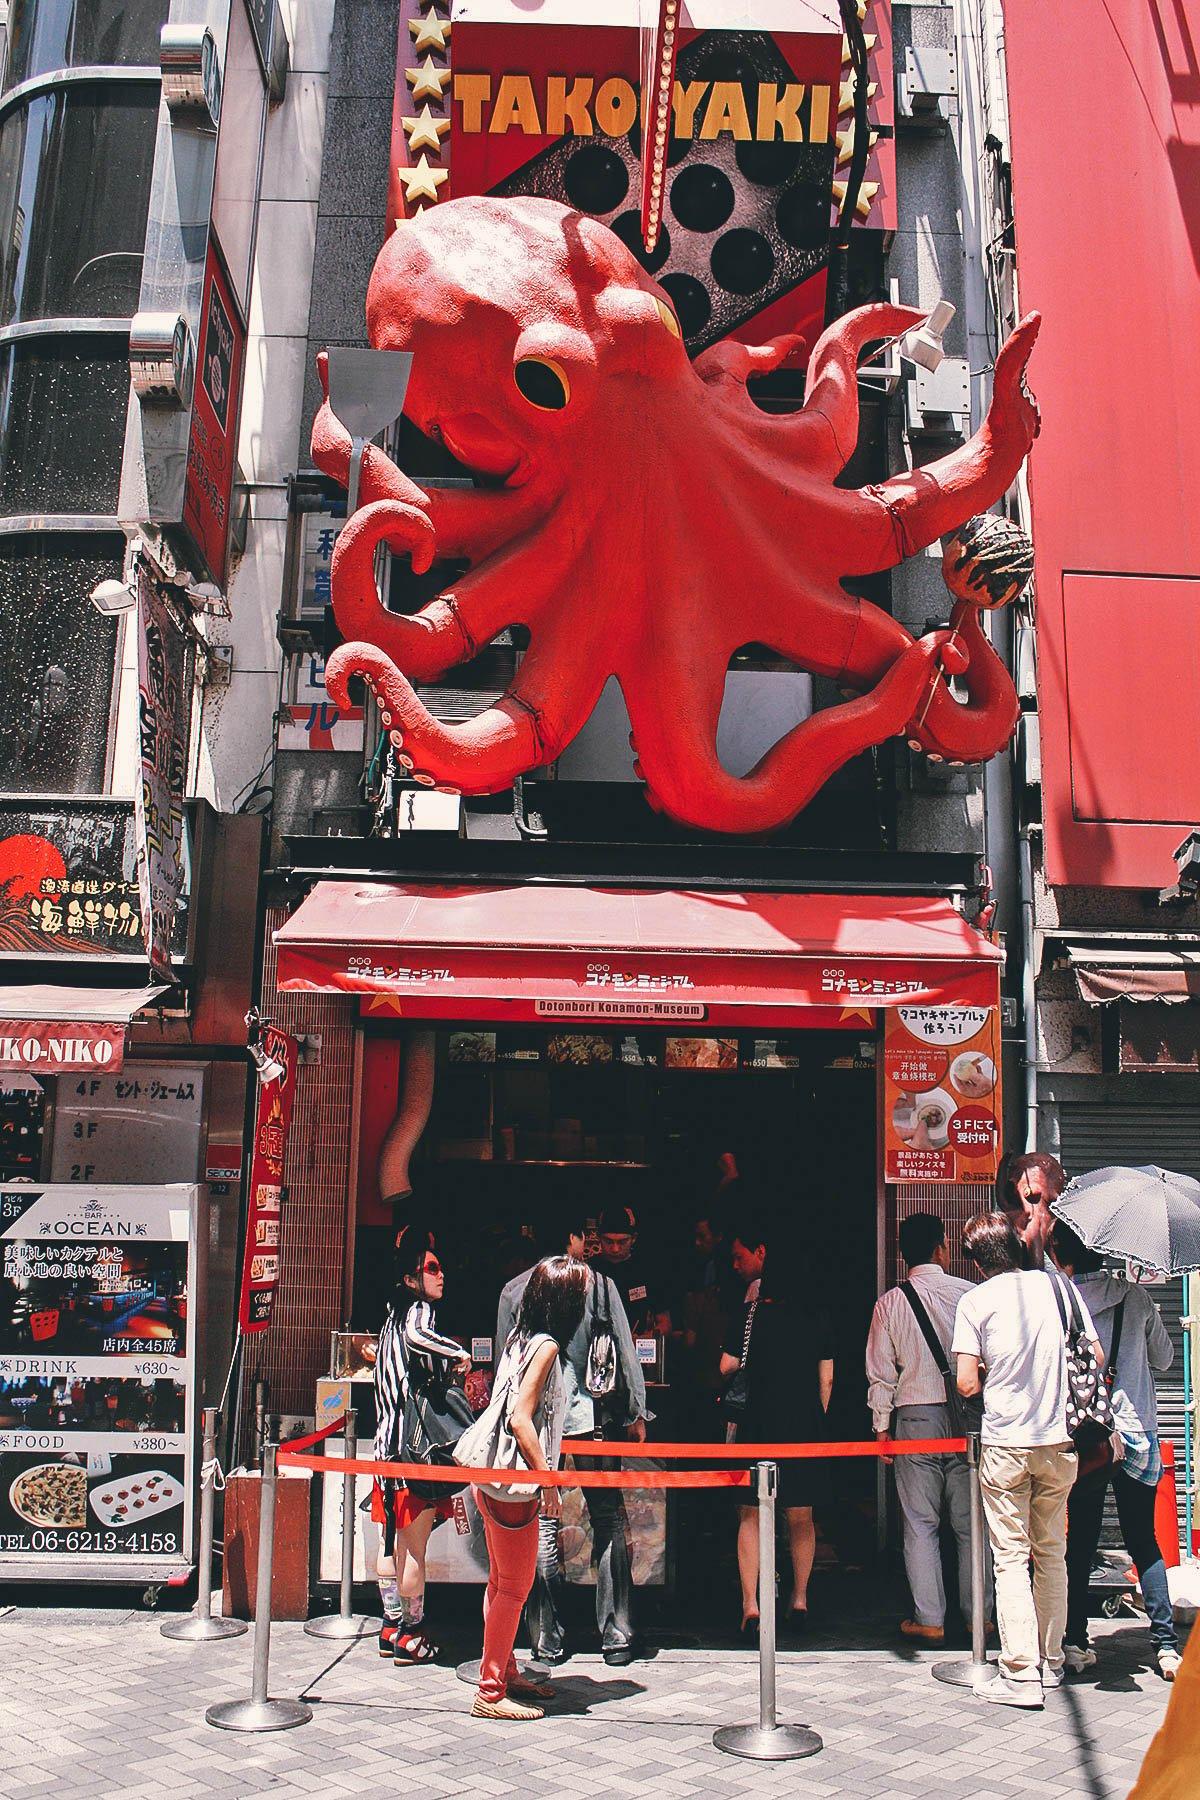 Takoyaki stand in Dotonbori, Osaka